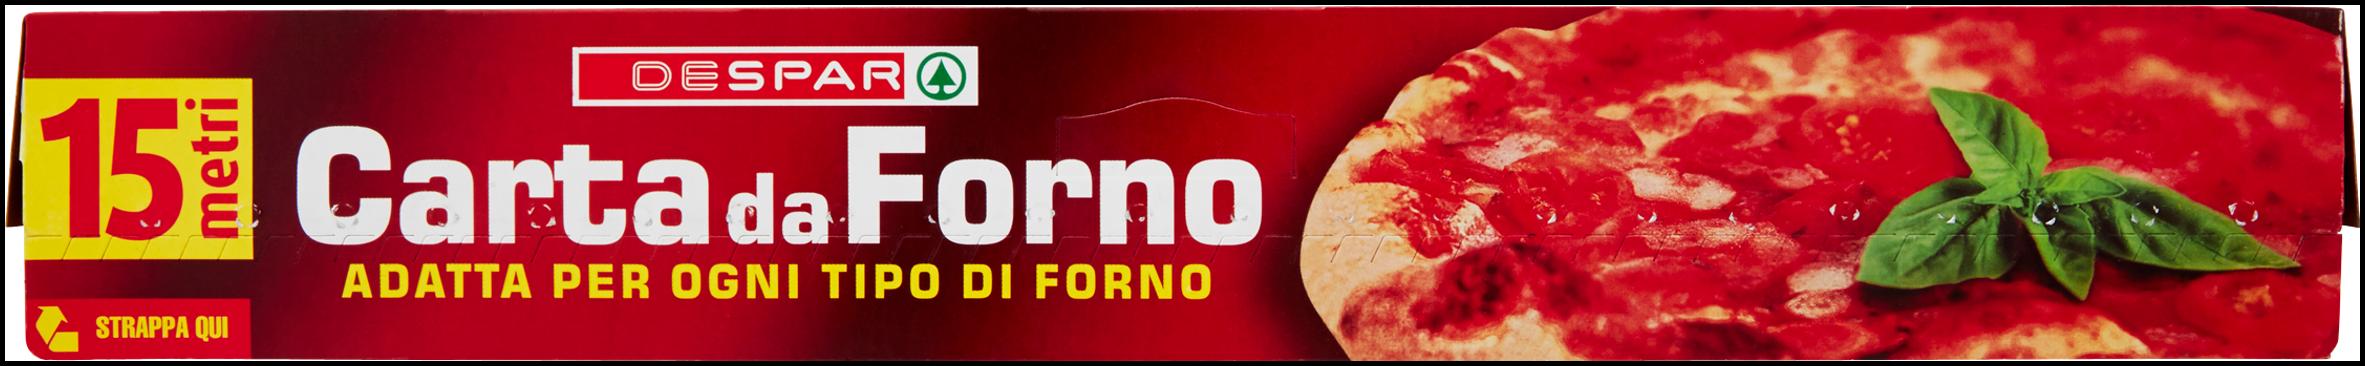 CARTA FORNO DESPAR MT.15